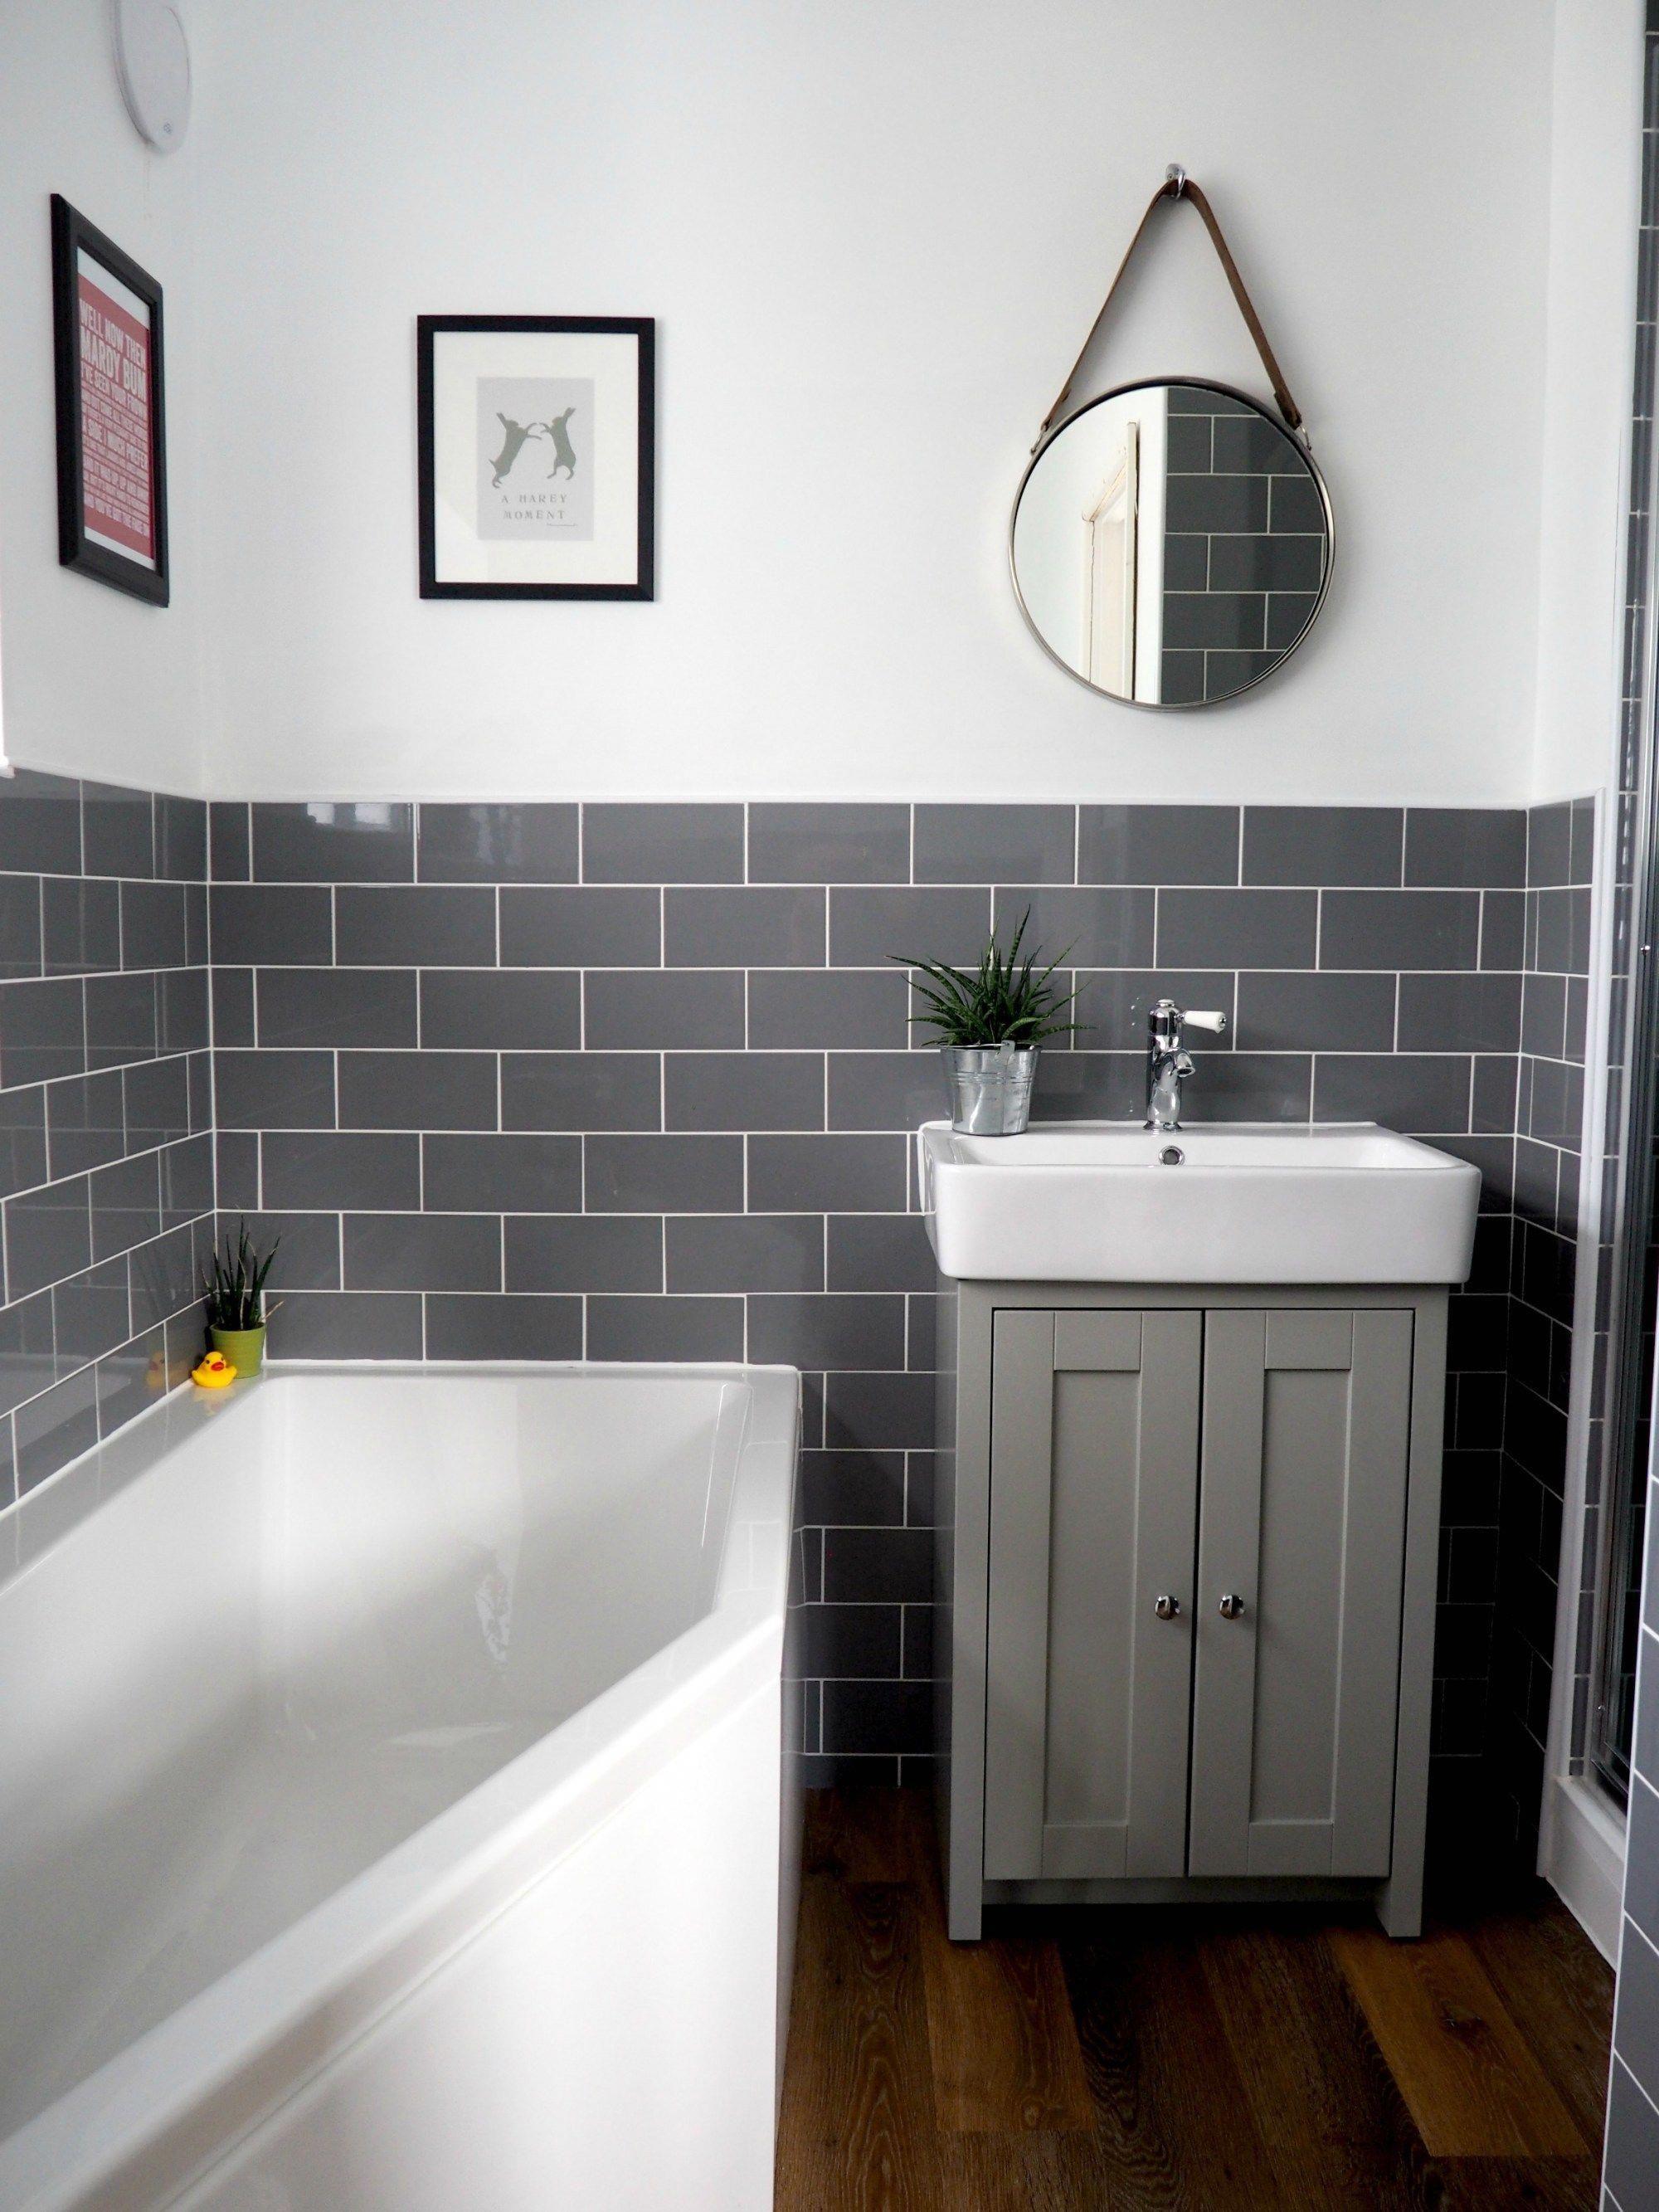 Our brand new bathroom renovation   Grey Subway tiles ...